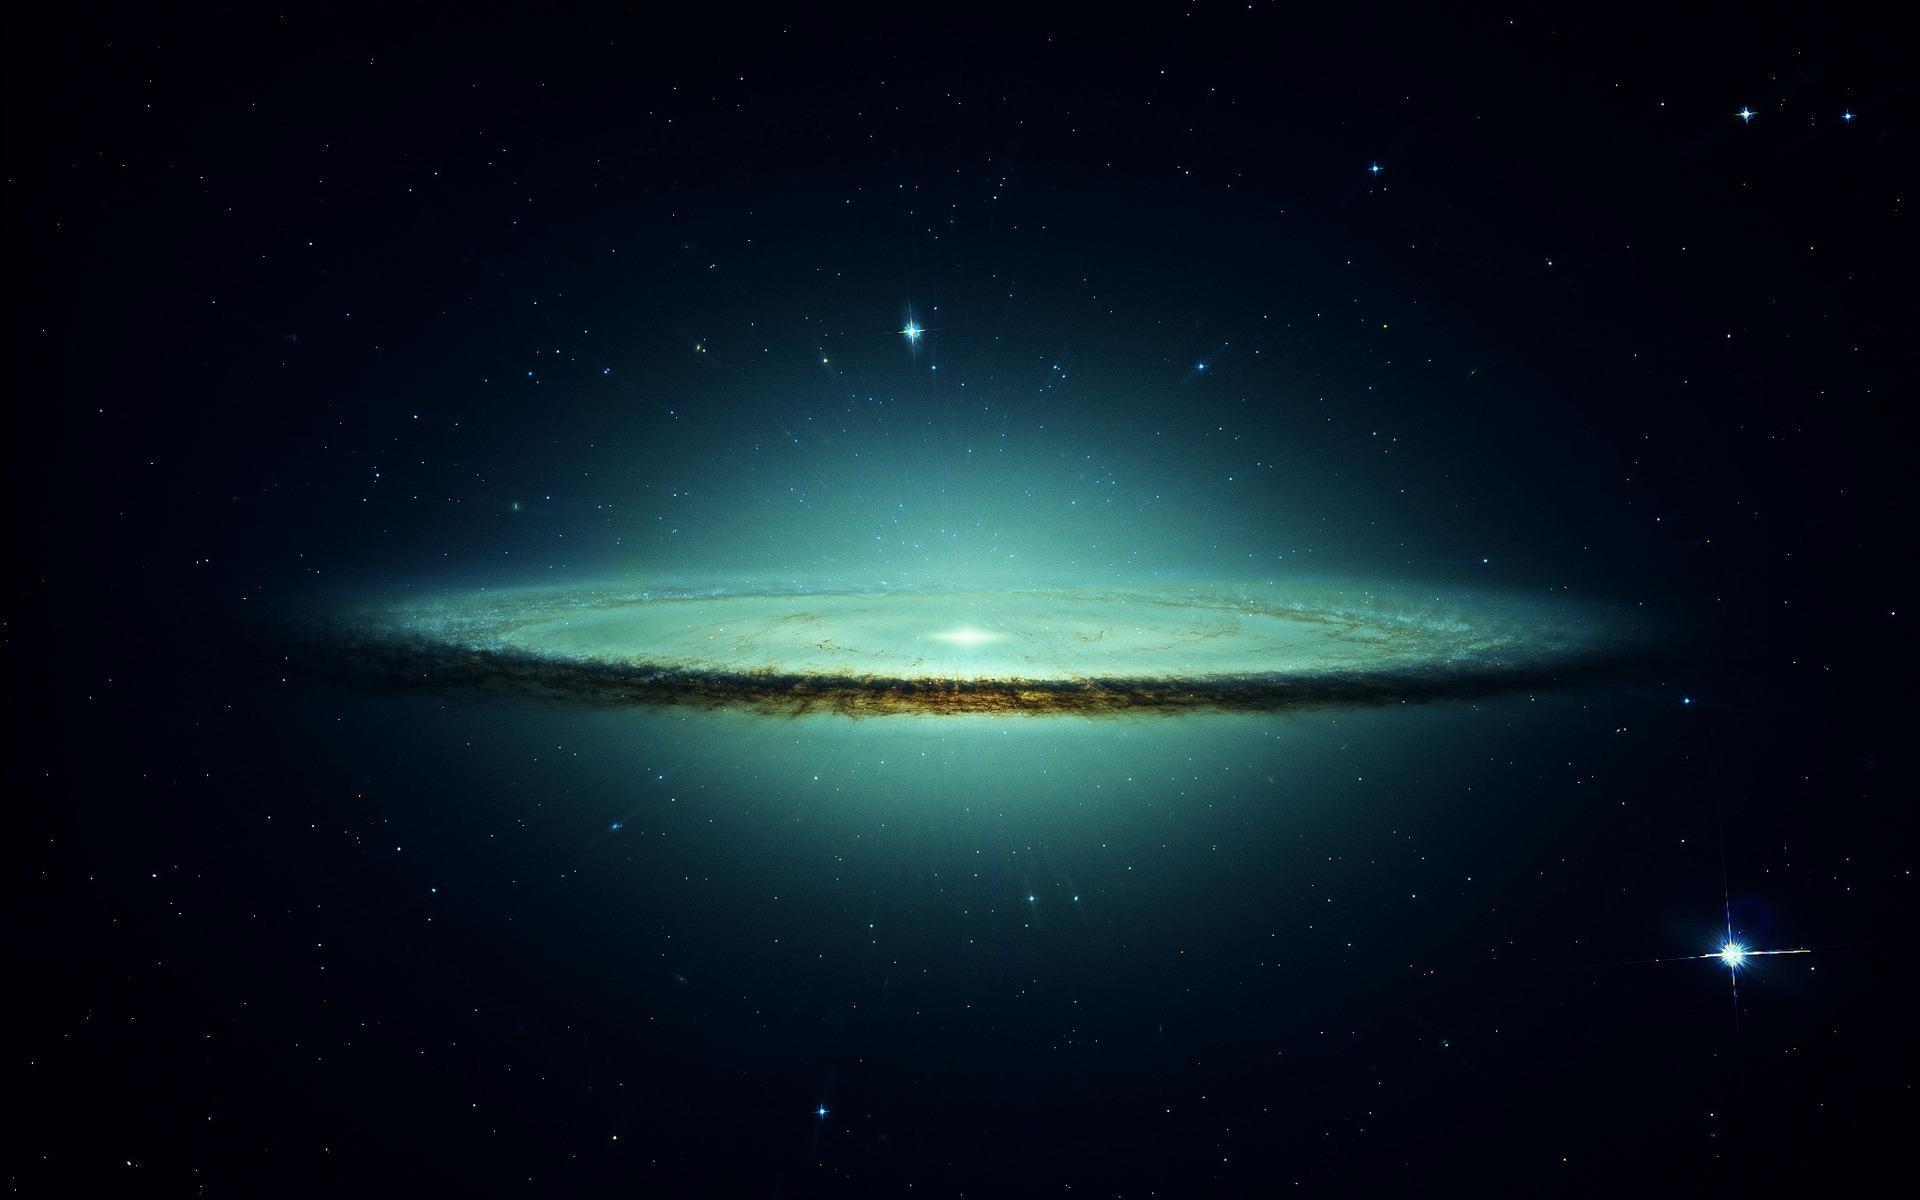 wallpaper.wiki-Free-Download-Hubble-Image-1920×1080-PIC-